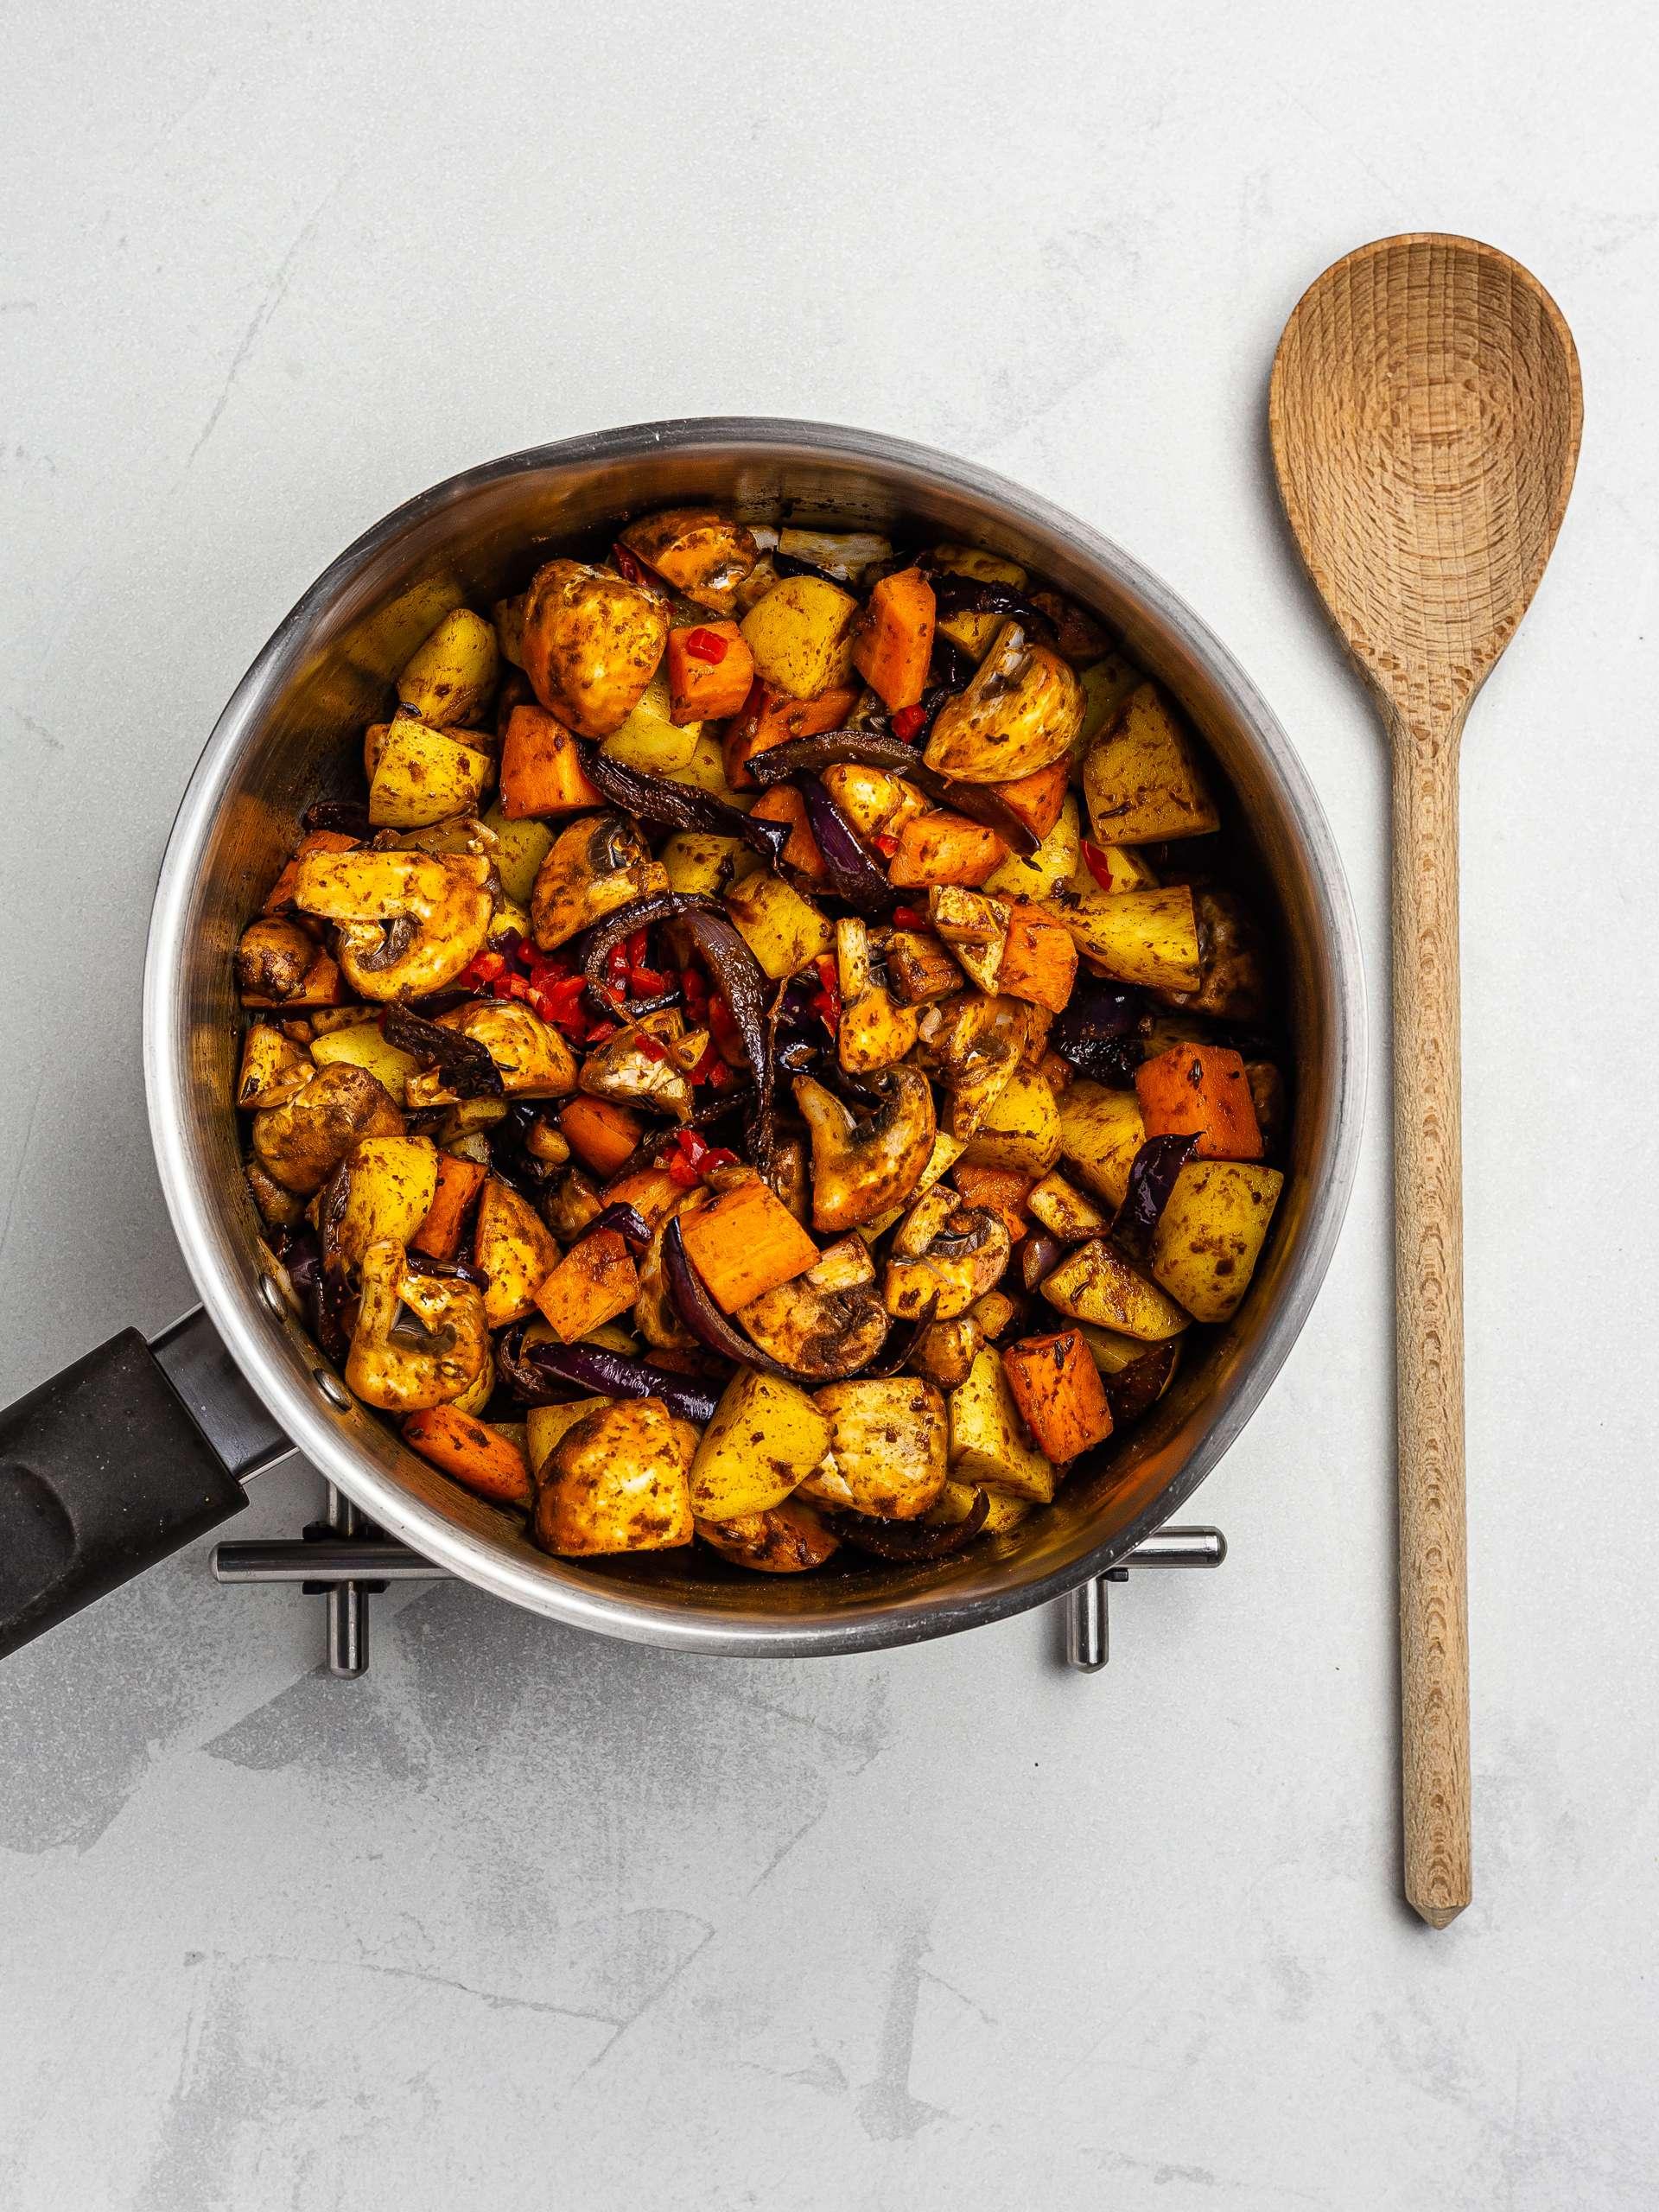 vegetable goulash in a pot